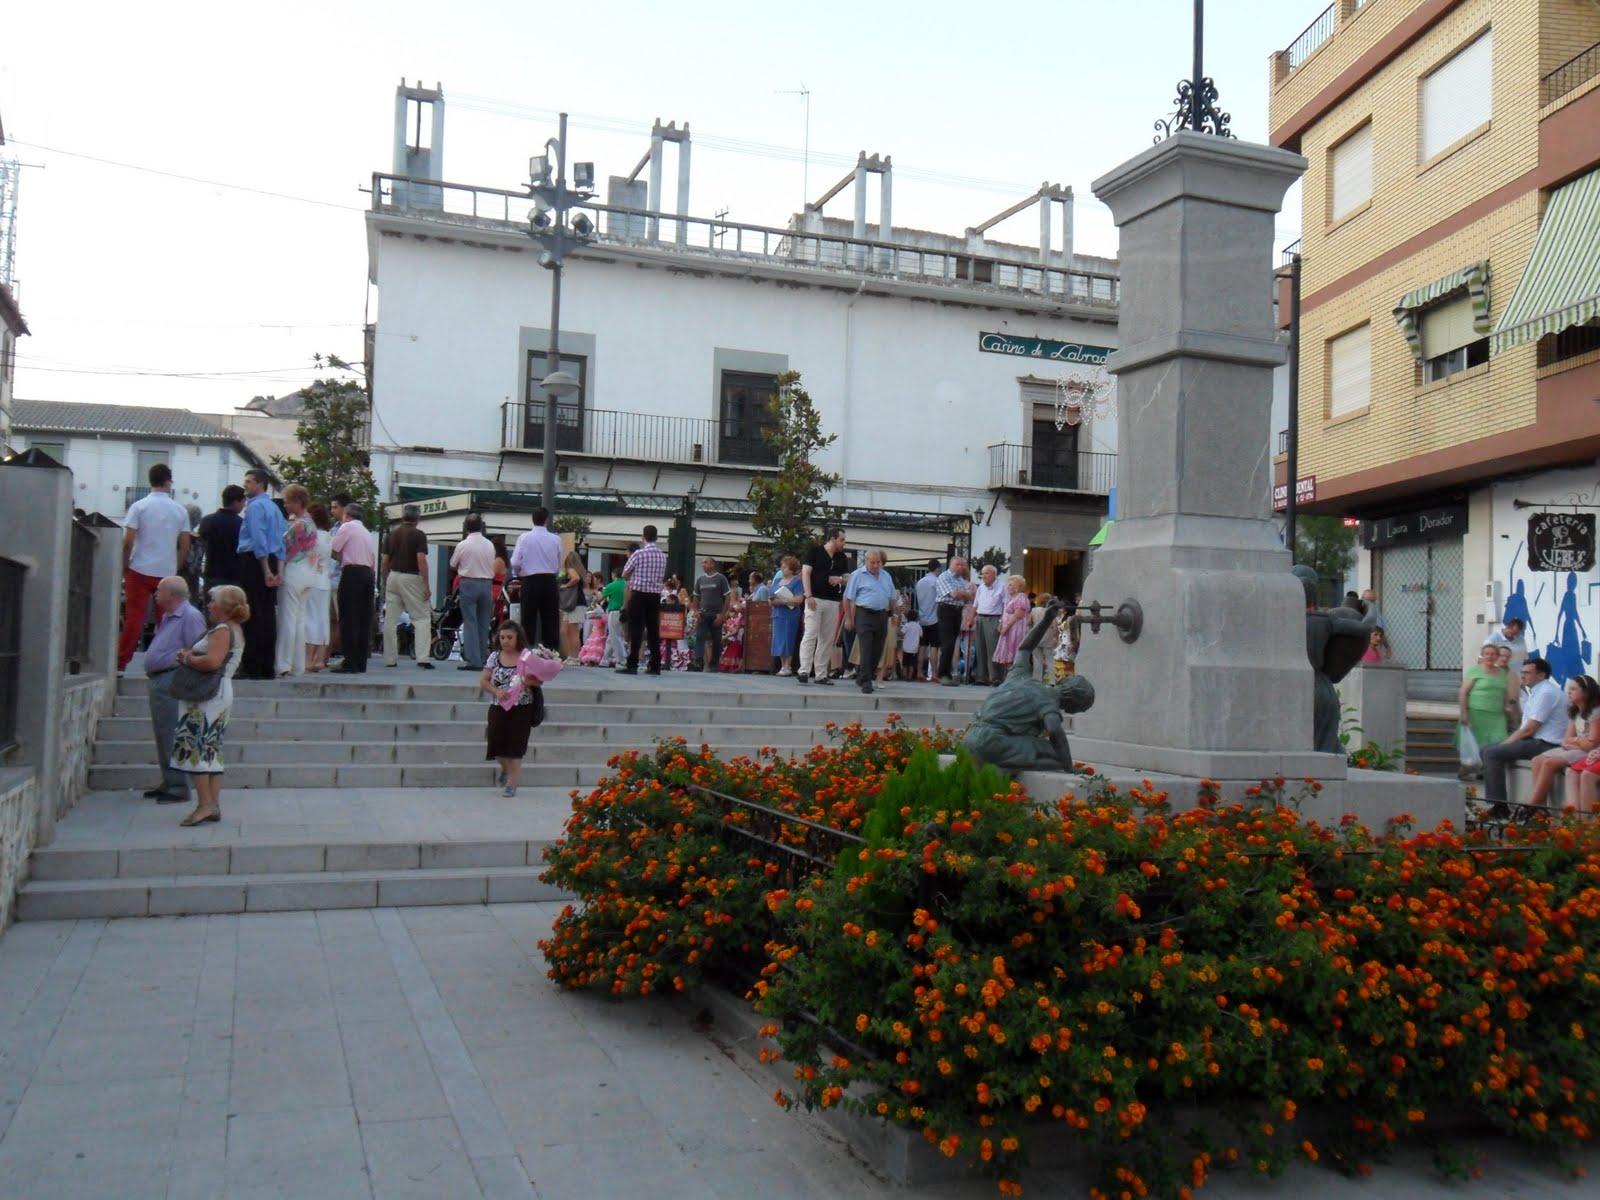 Proteccion civil atarfe ofrenda floral a santa ana - Santa ana atarfe ...